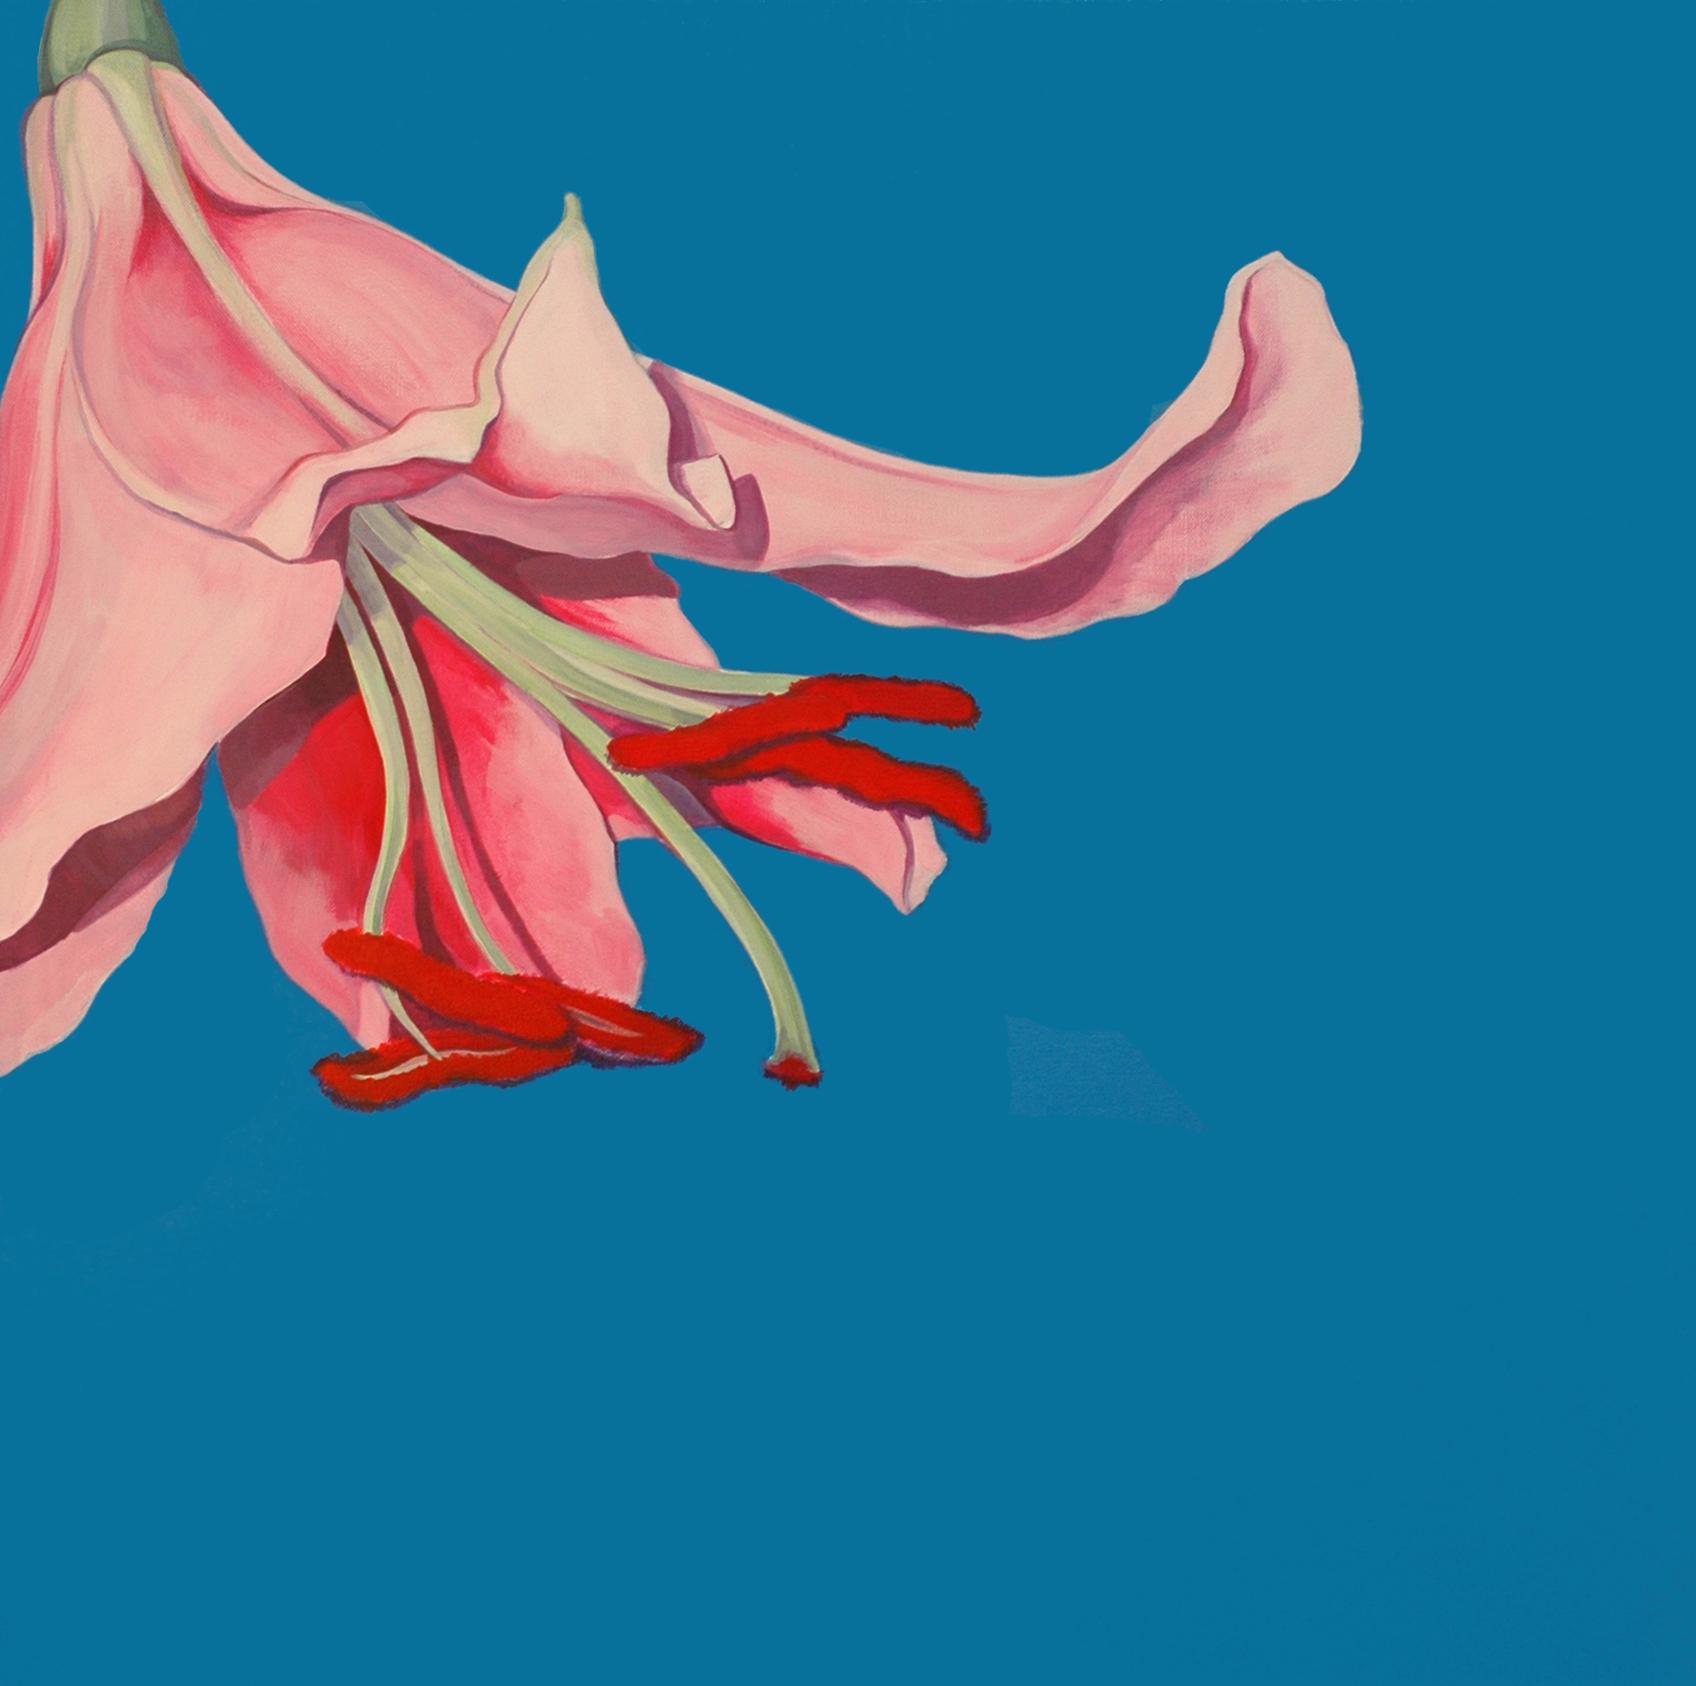 Die Lilie I, Acryl (80x80cm)